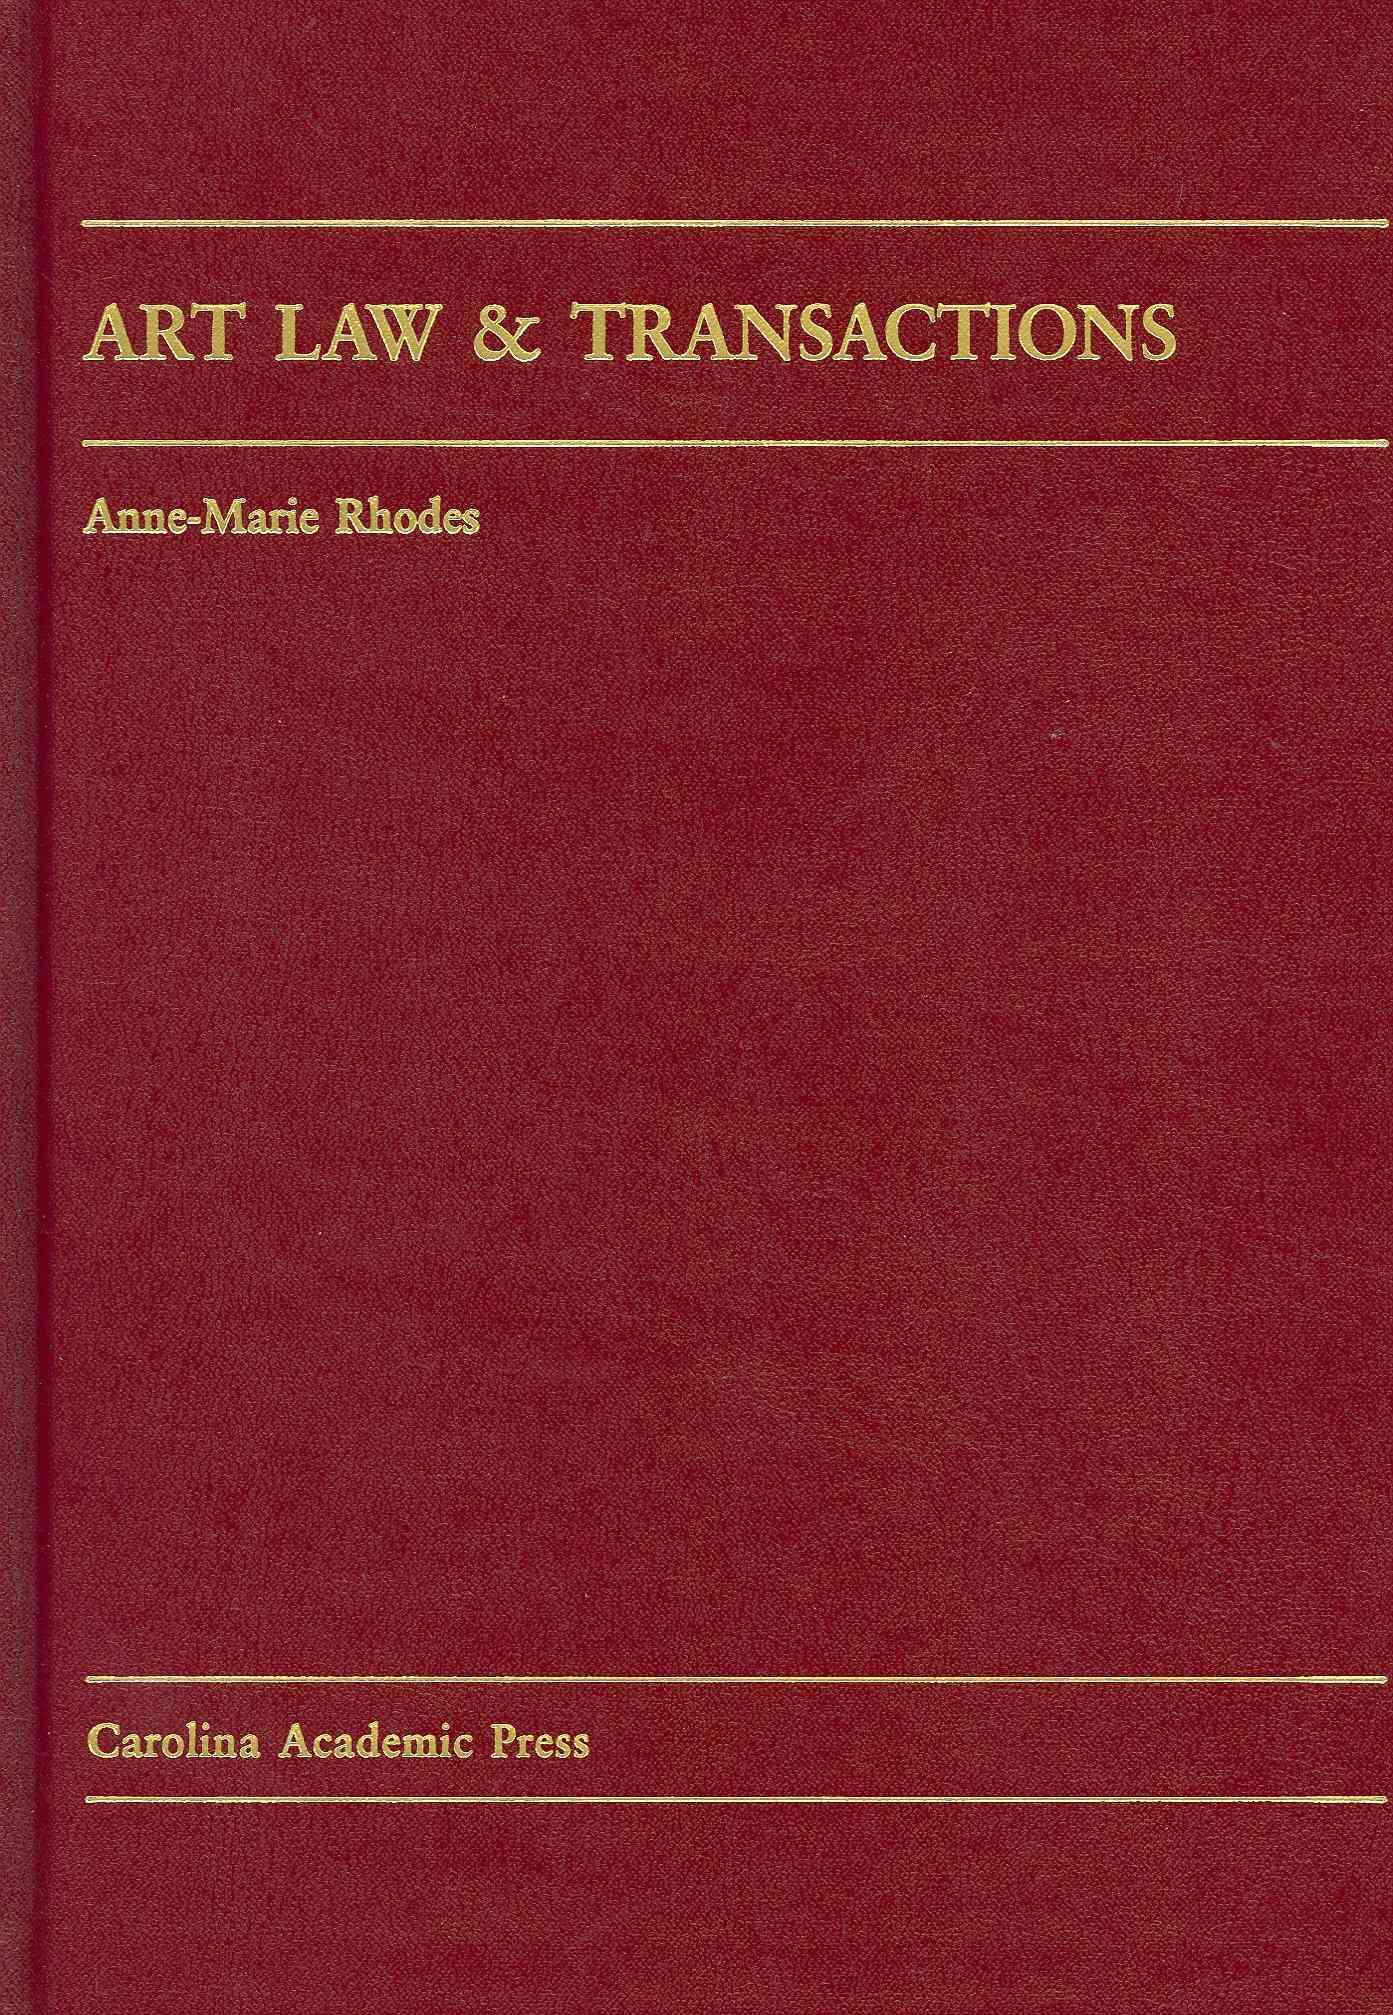 Art Law & Transactions